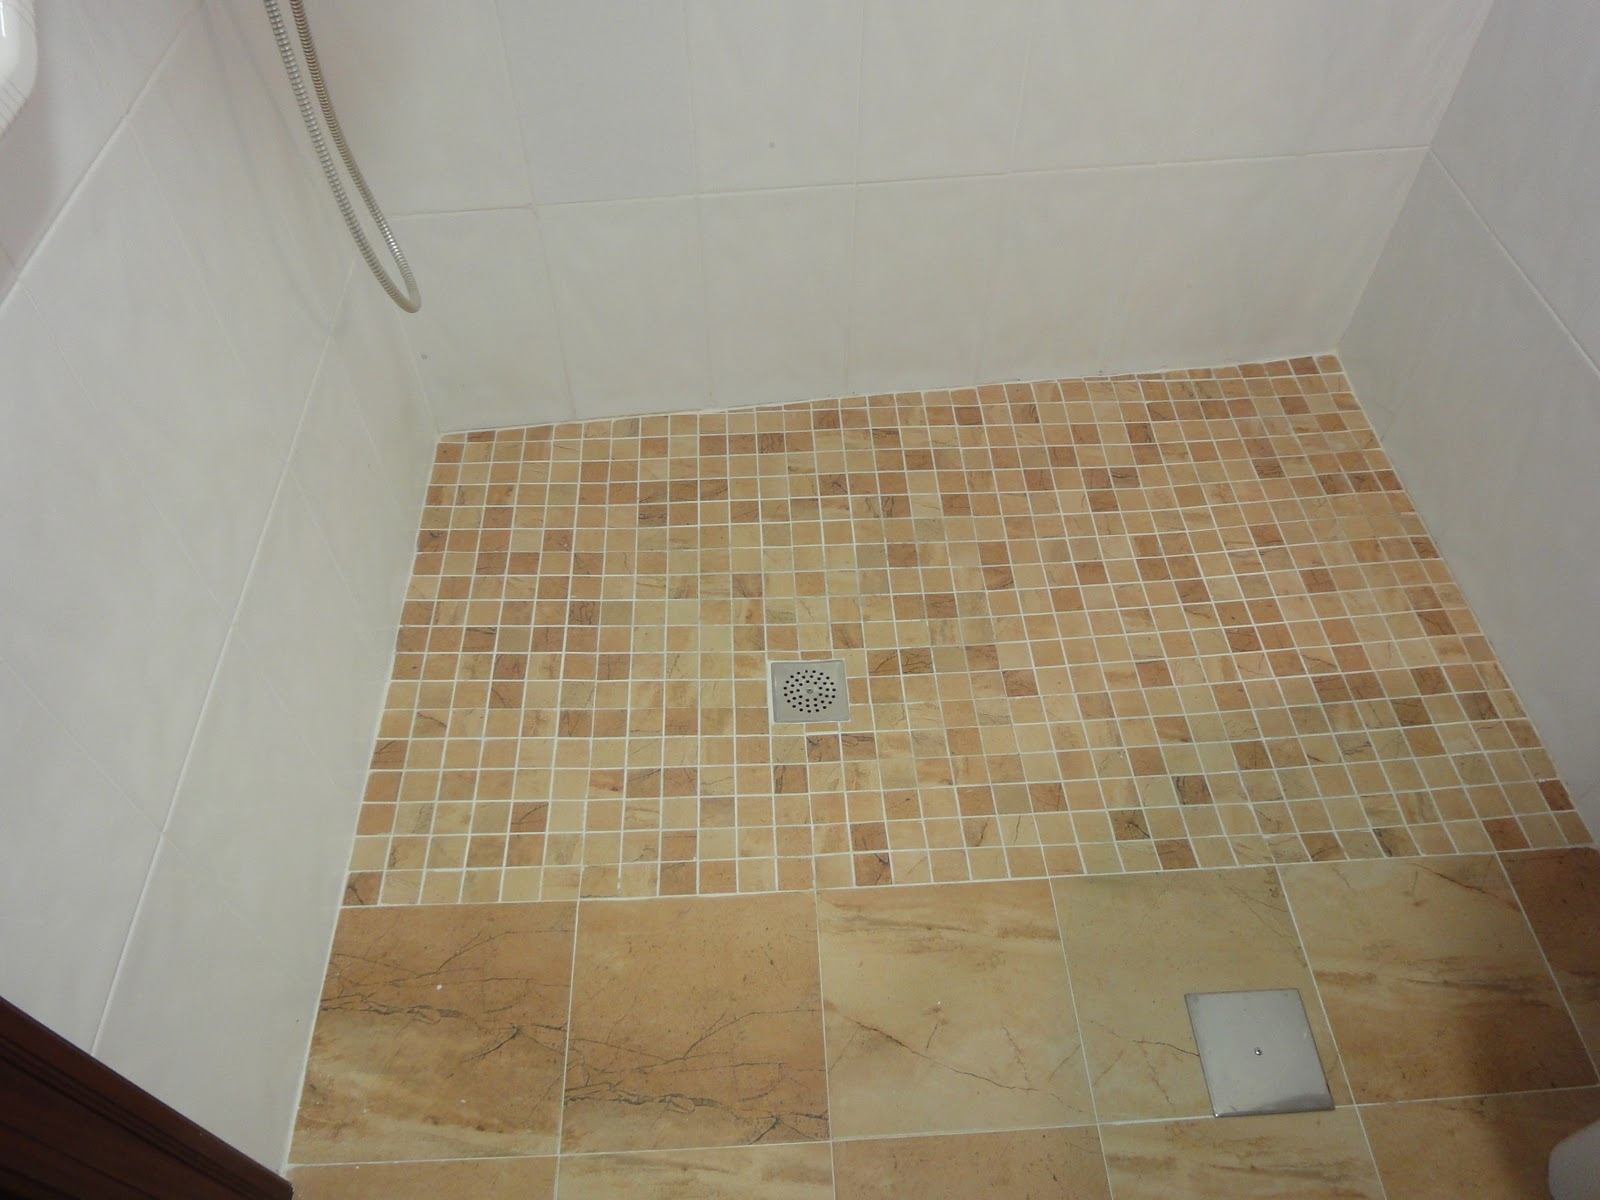 Asturiana de azulejos platos de ducha de obra - Azulejos para ducha ...